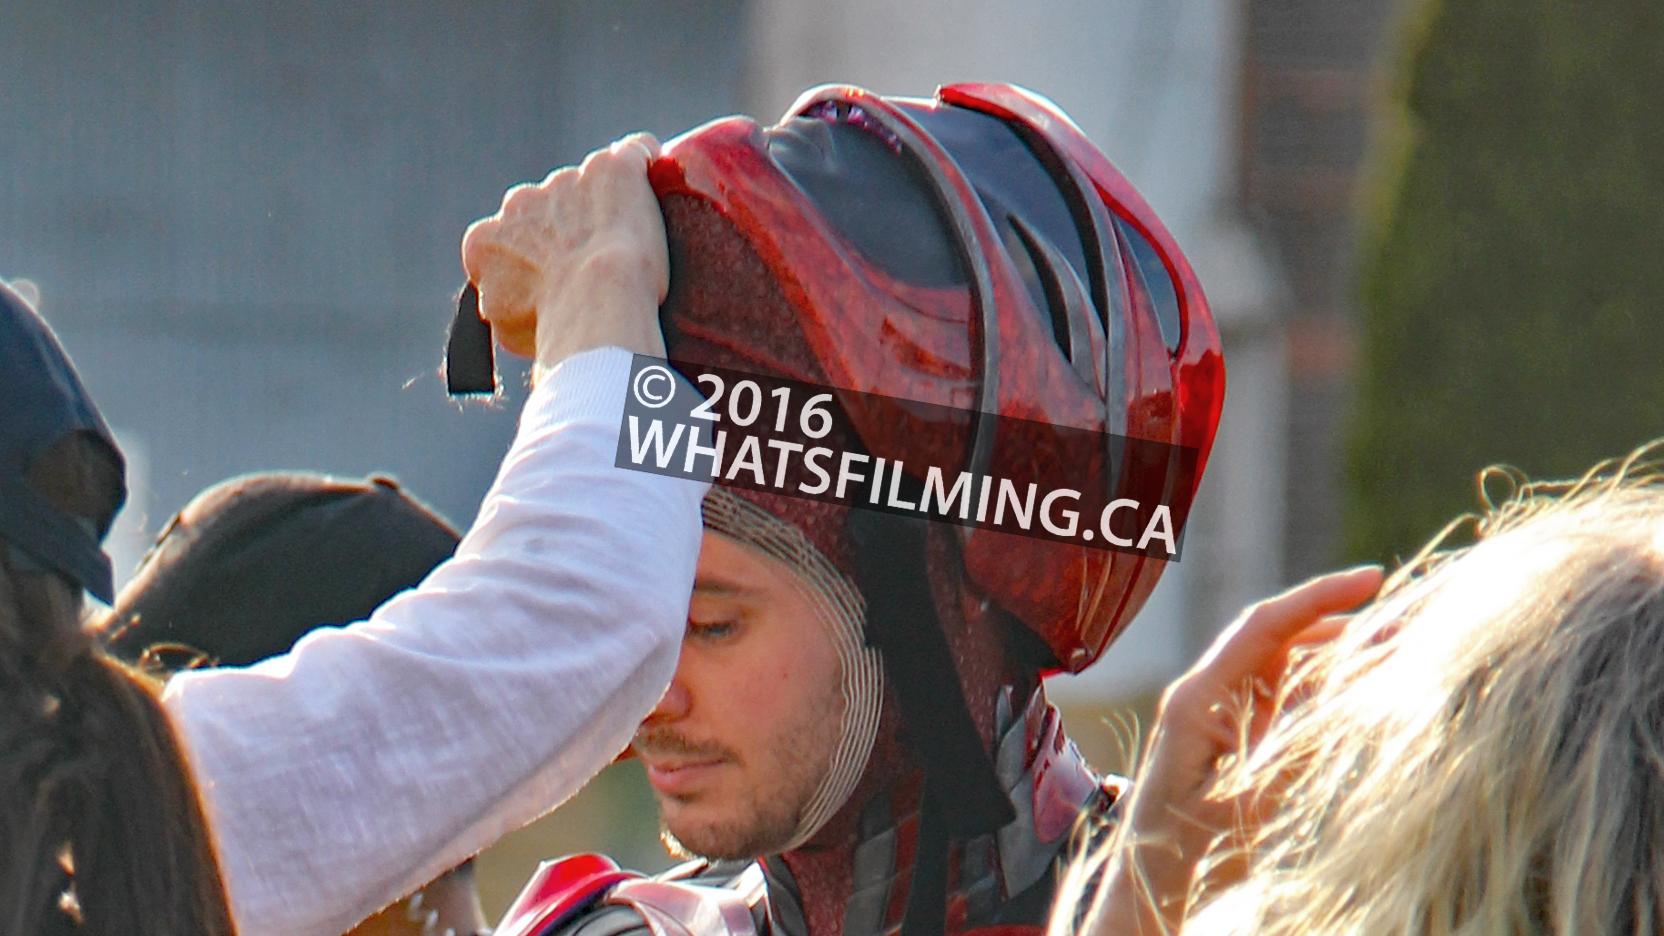 Power Rangers Movie: Closeup of the Red Ranger suit's helmet